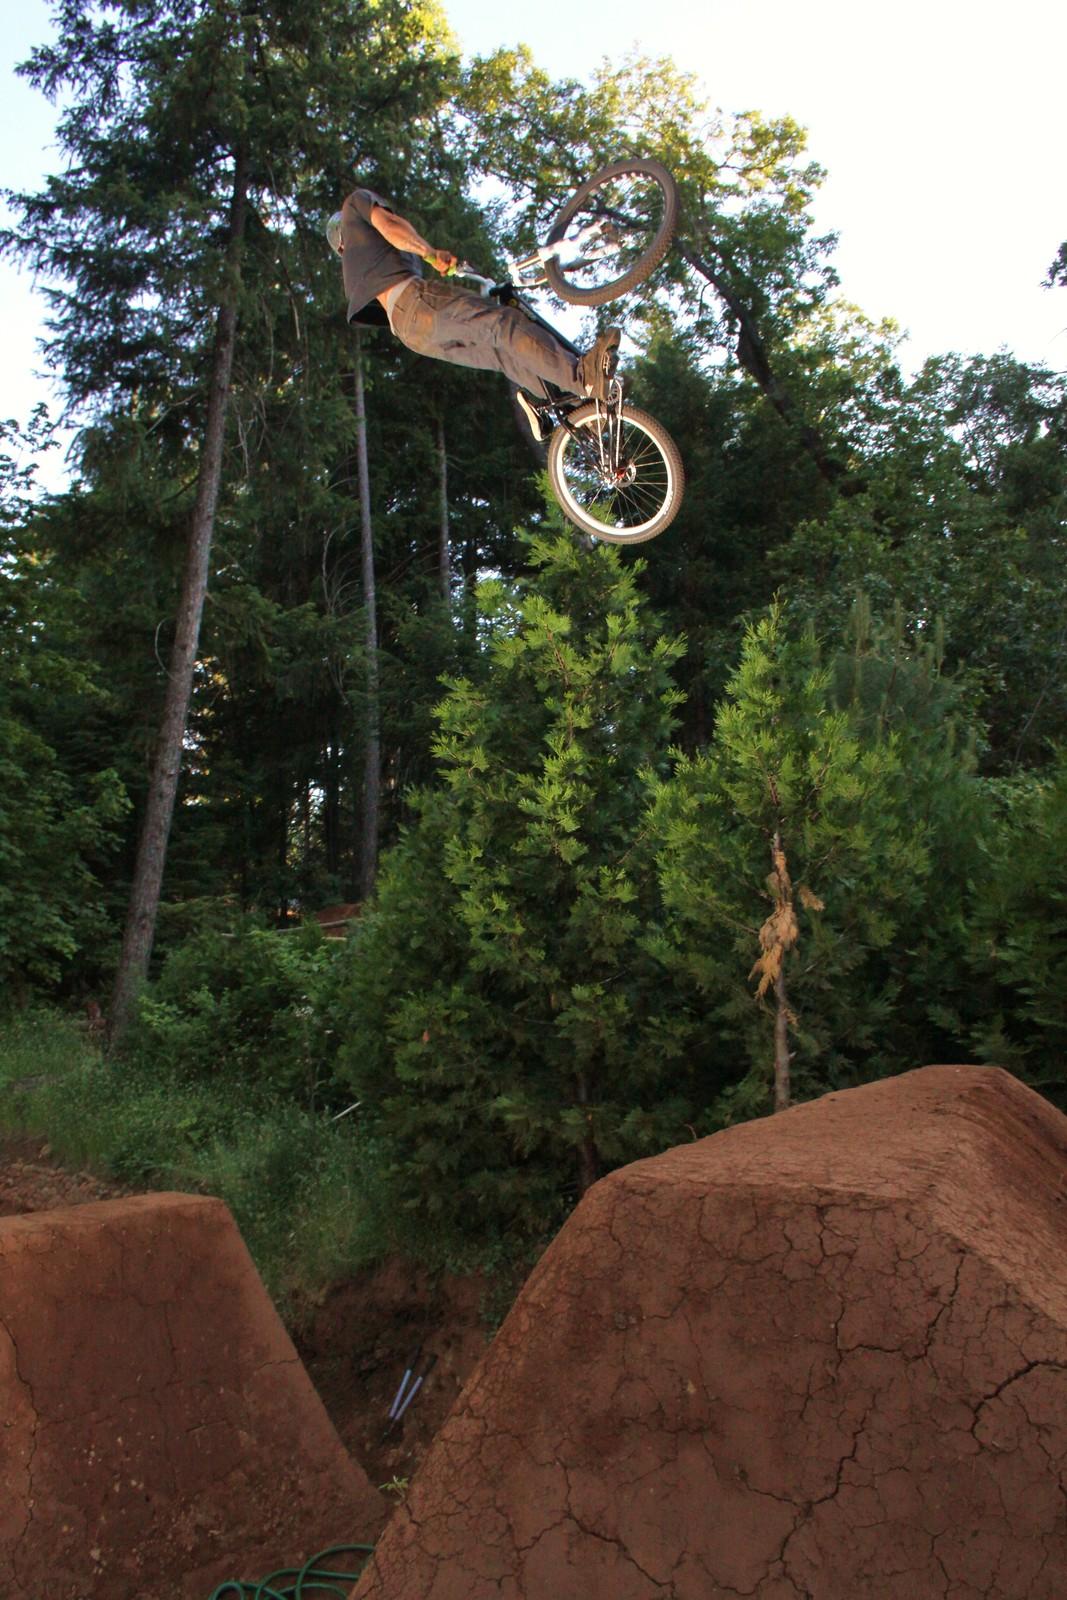 043 - ZD - Mountain Biking Pictures - Vital MTB